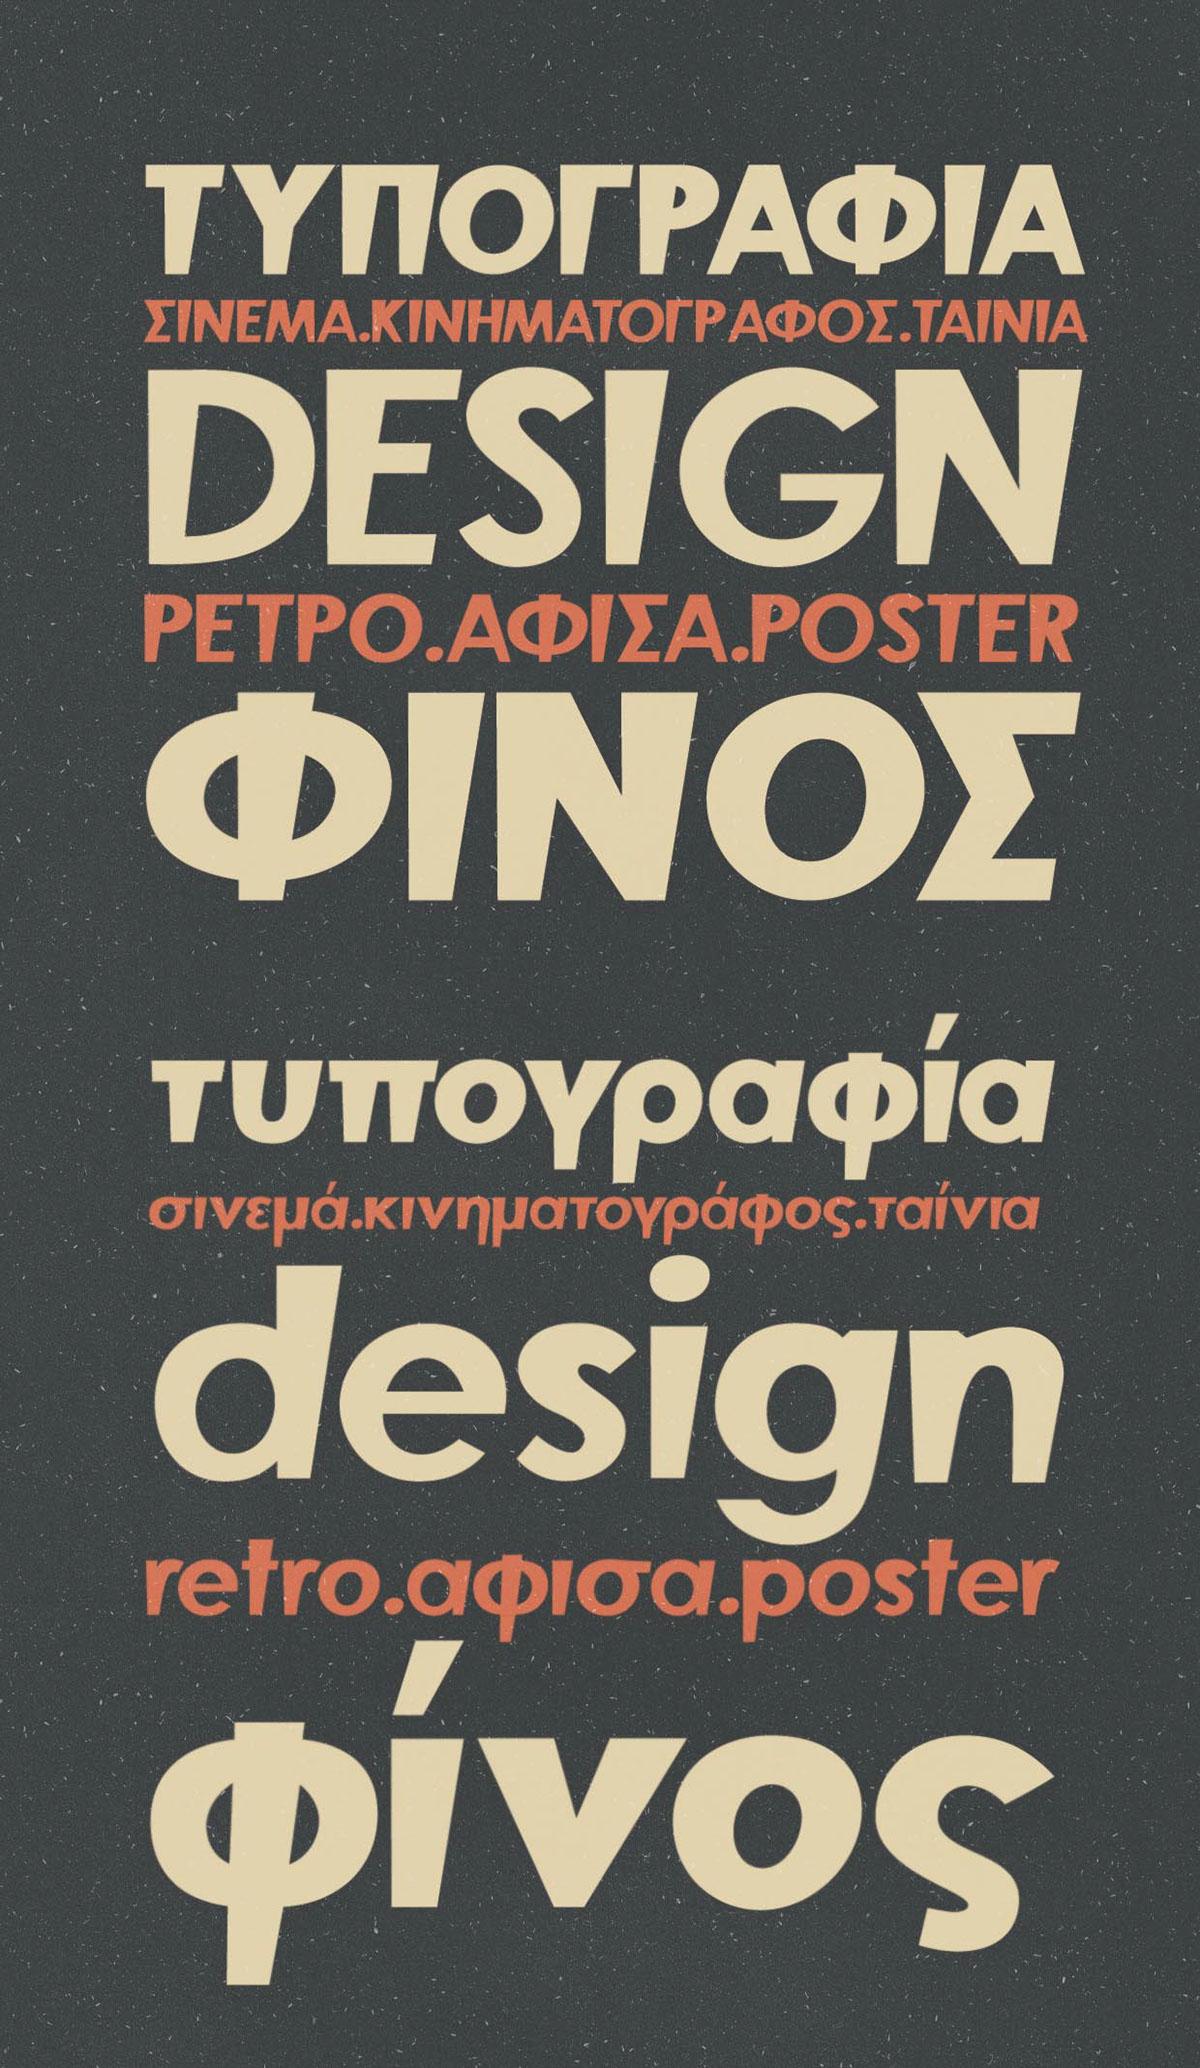 font Typeface finos Display Headline logo magazine trend poster Retro modern typeface design